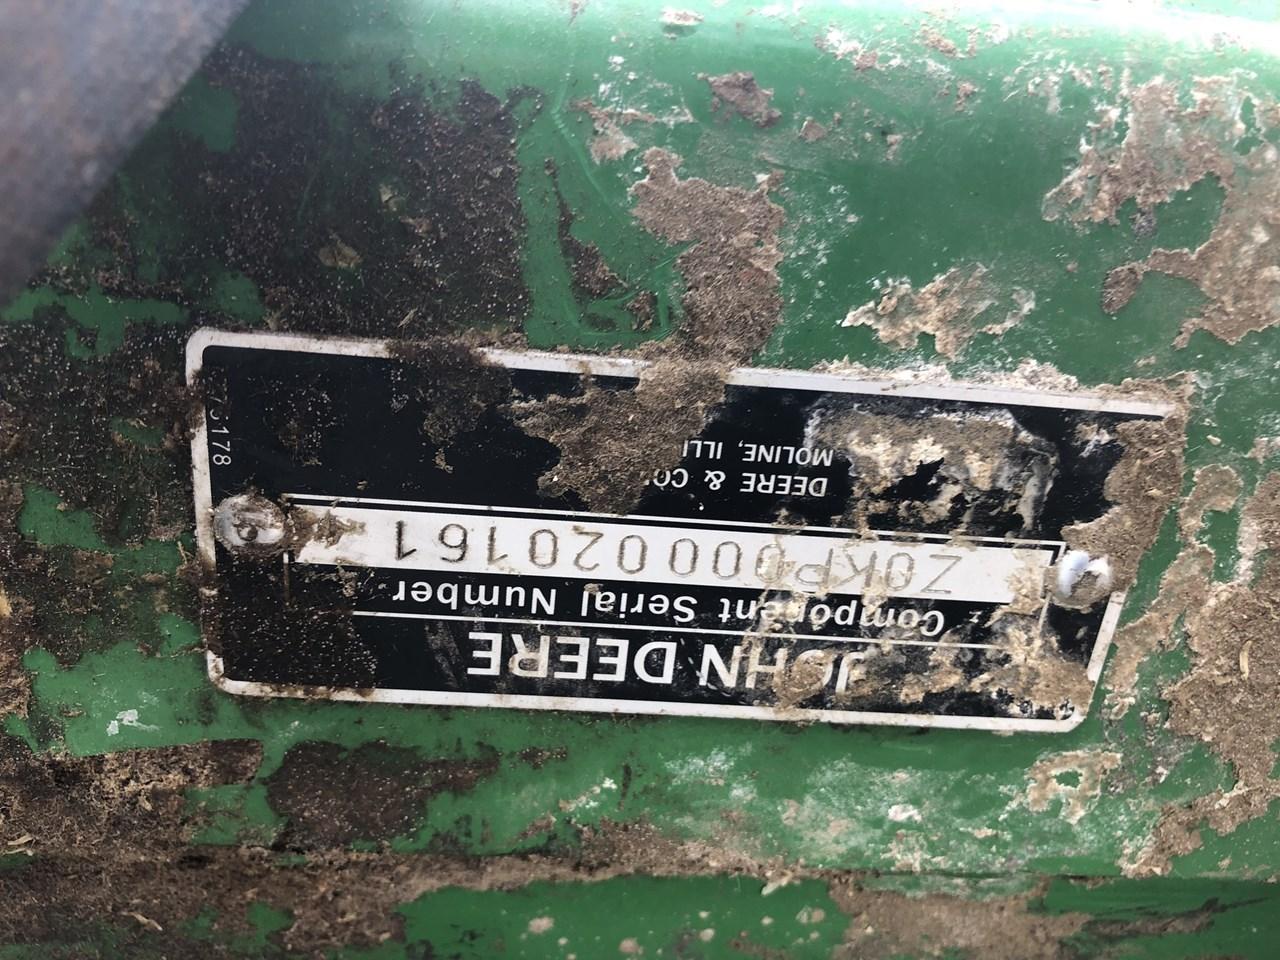 2015 John Deere 8000 WIDE BODY KERNEL PROCESSOR Image 5